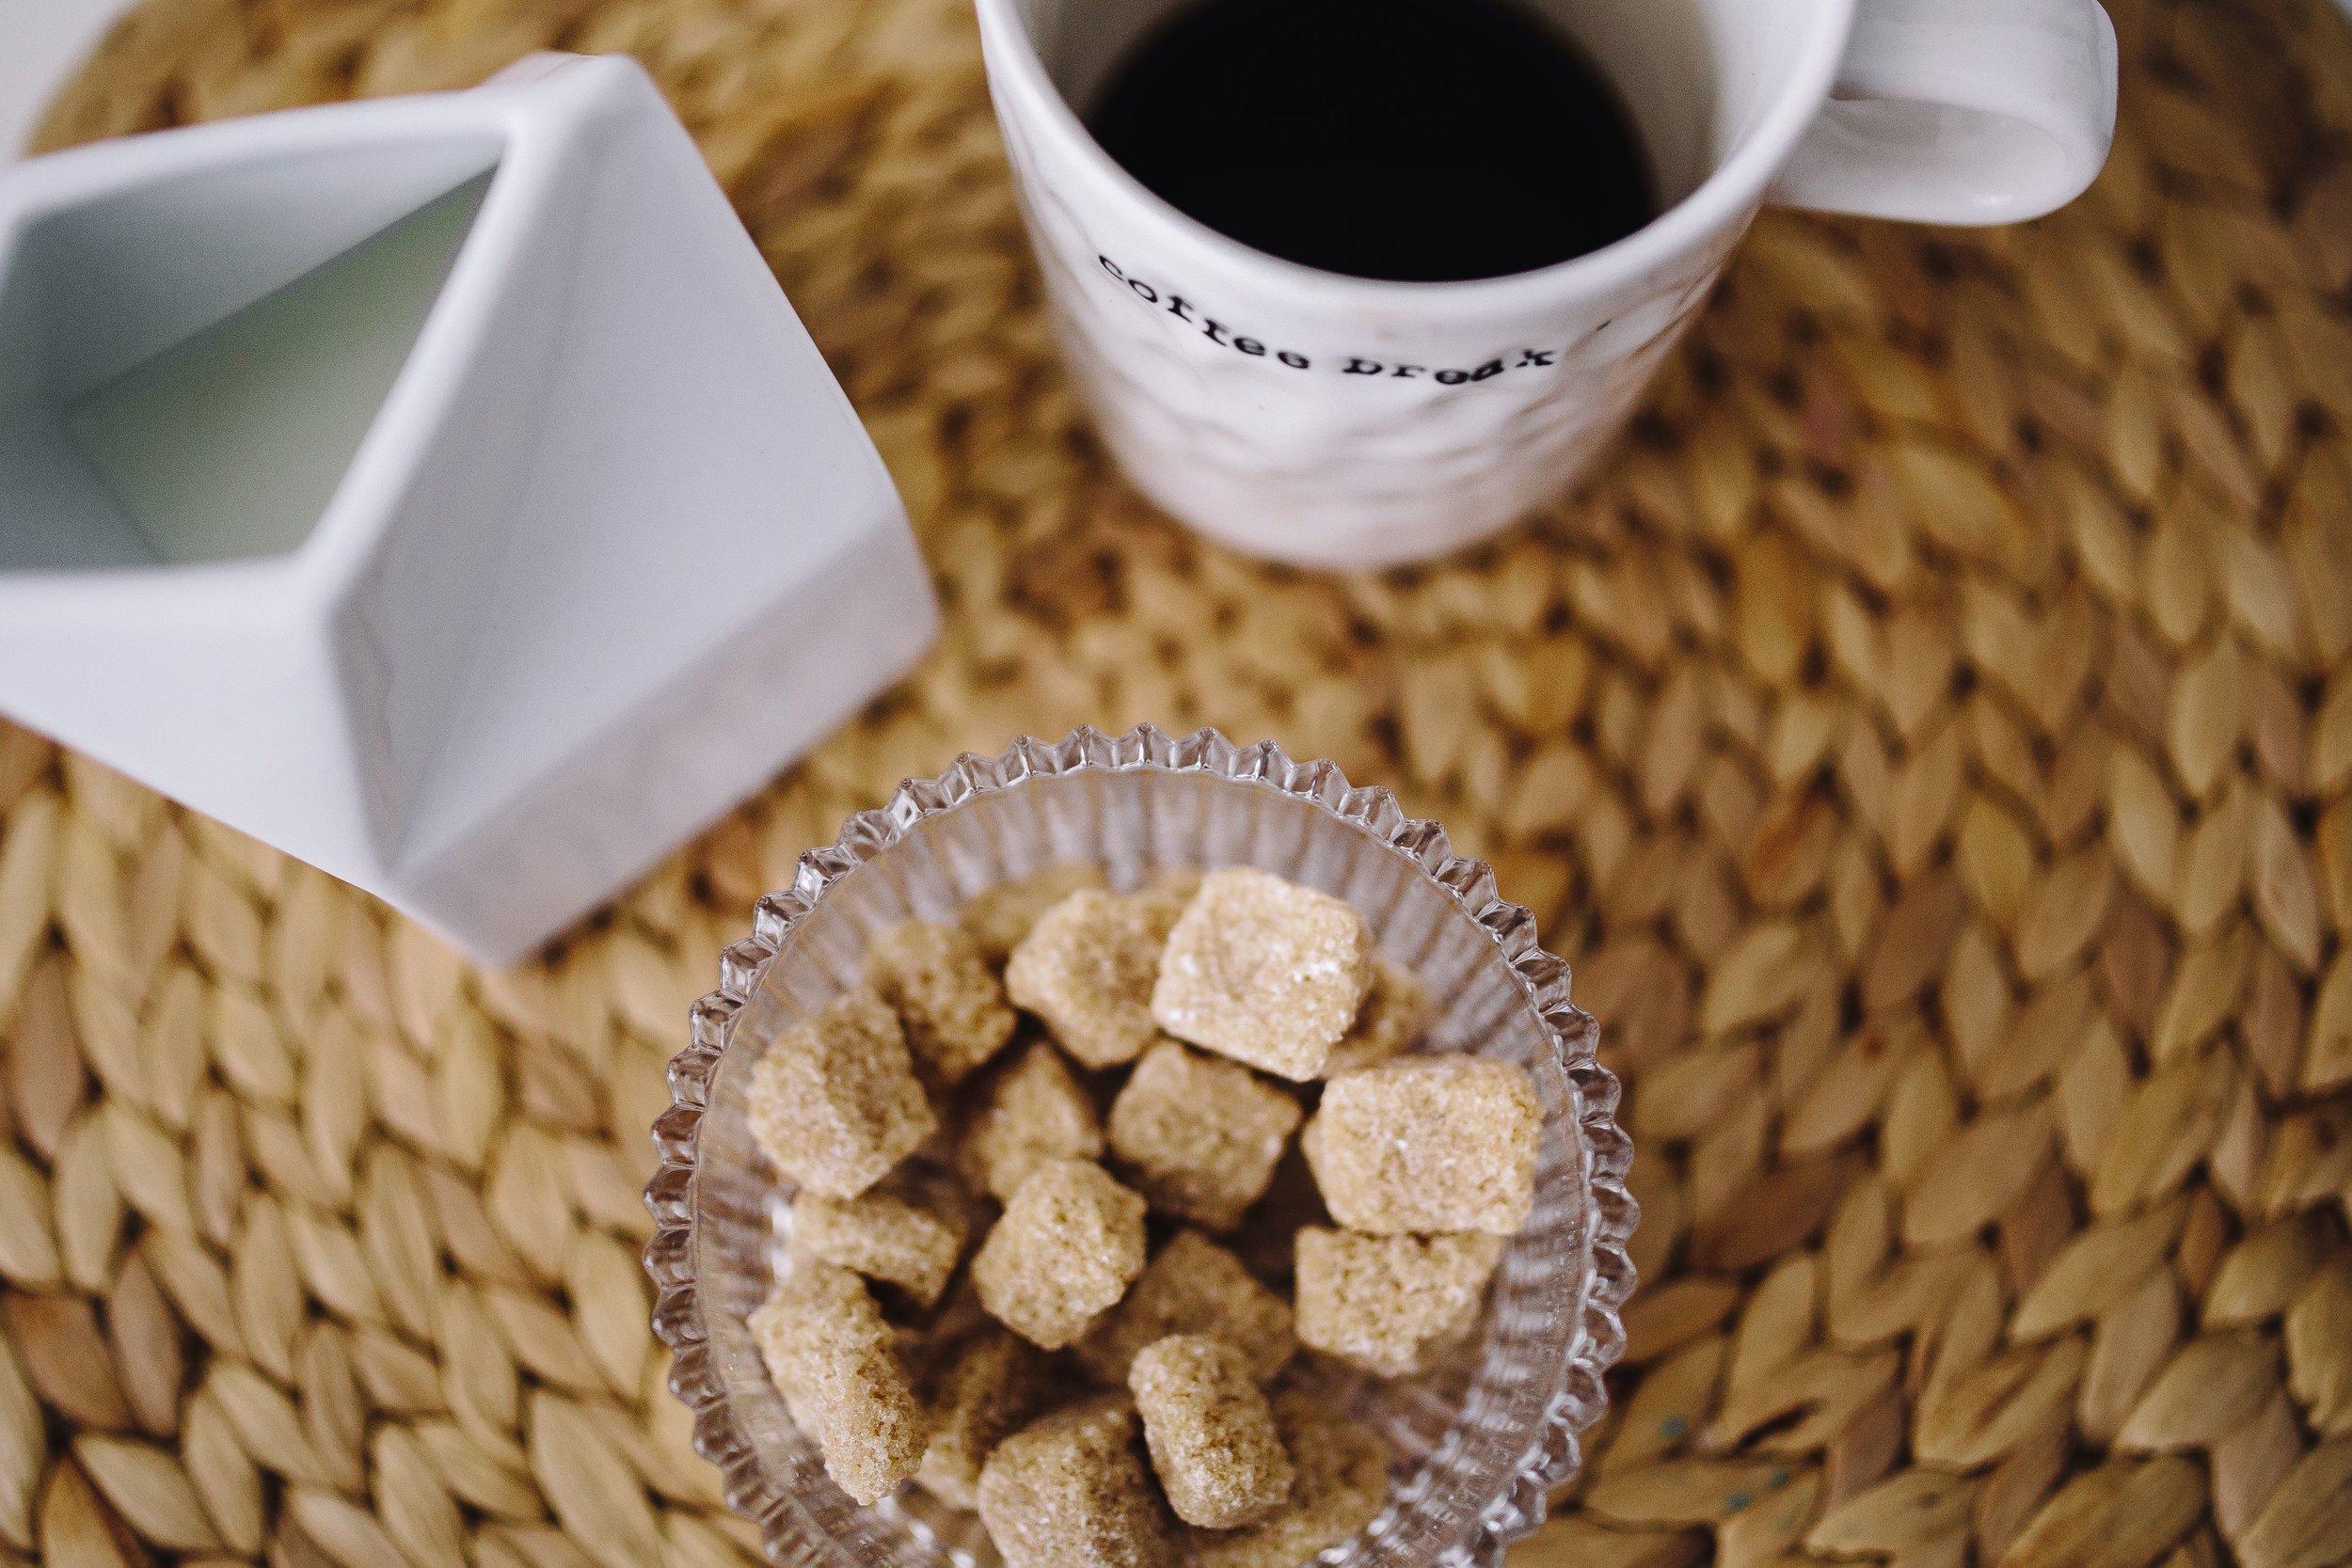 kaboompics_Sweet dessert with coffee.jpg